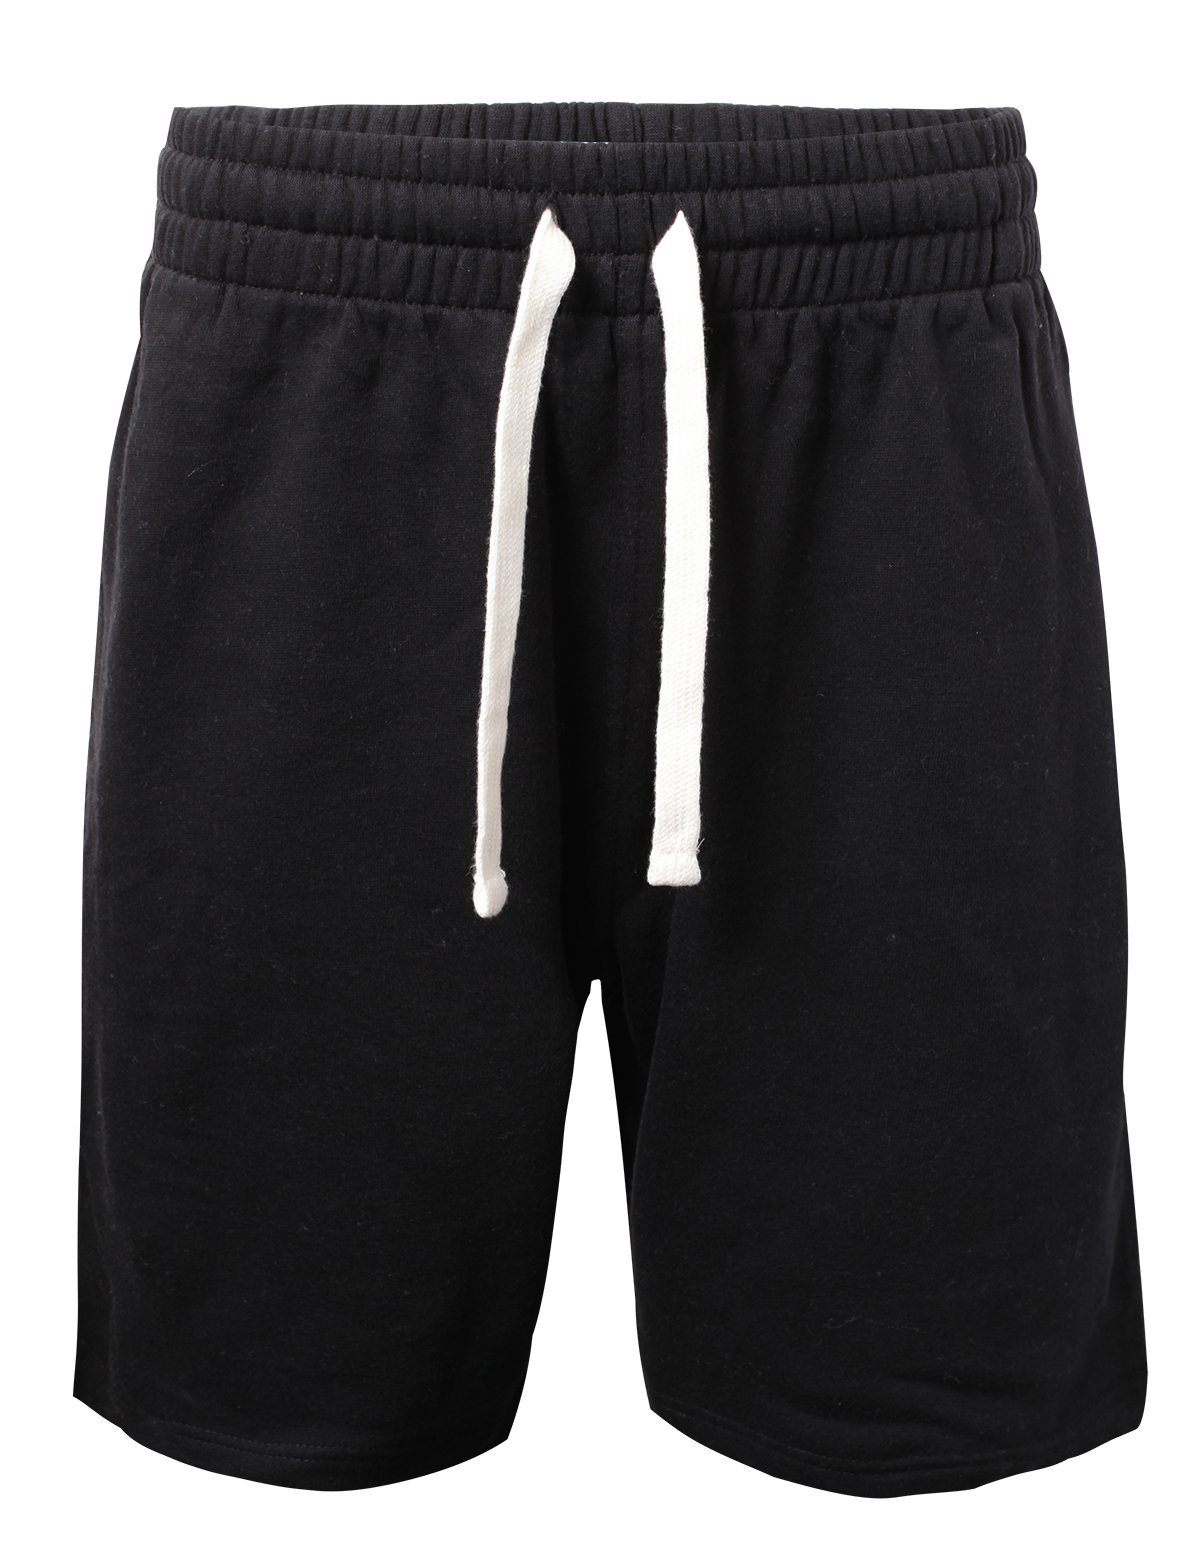 ProGo Men's Casual Basic Fleece Marled Shorts Pants with Elastic Waist (Black, Medium)